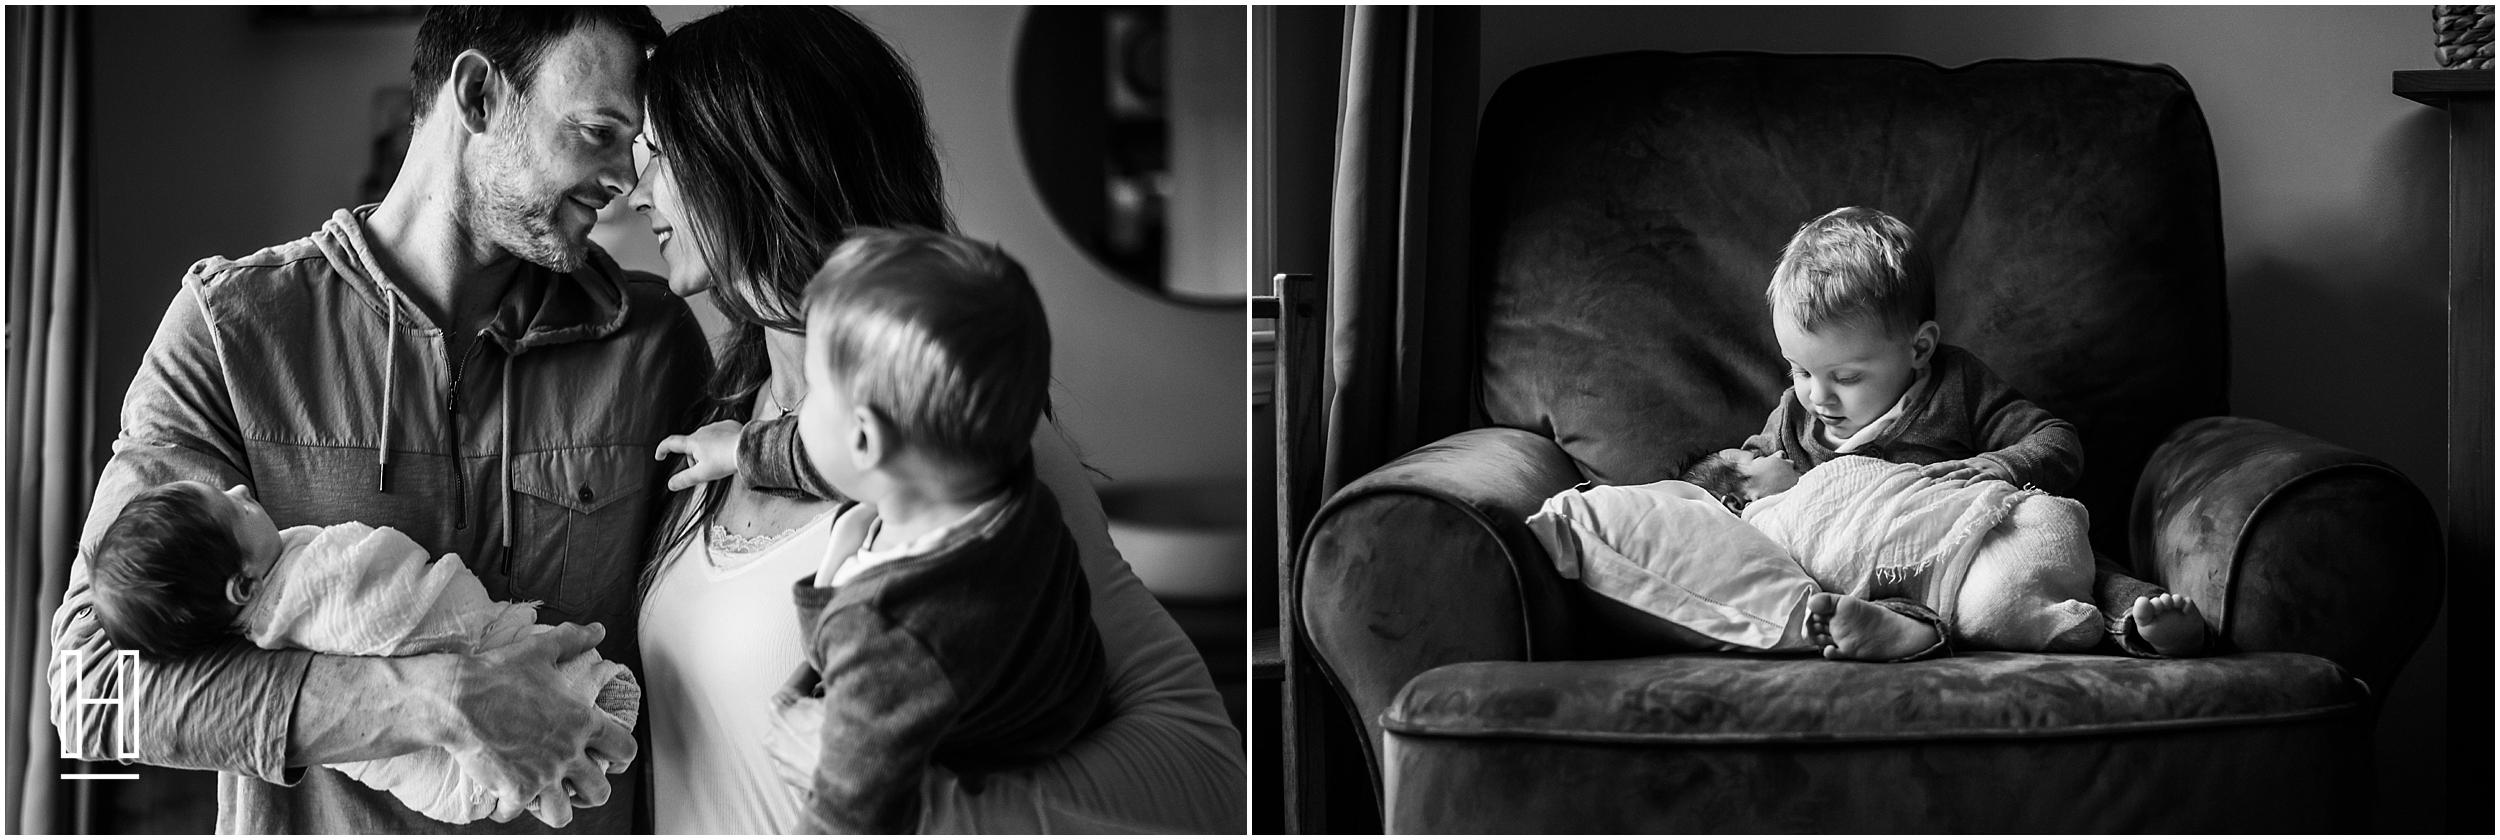 atlanta_newborn_photographer-photography_0416.jpg